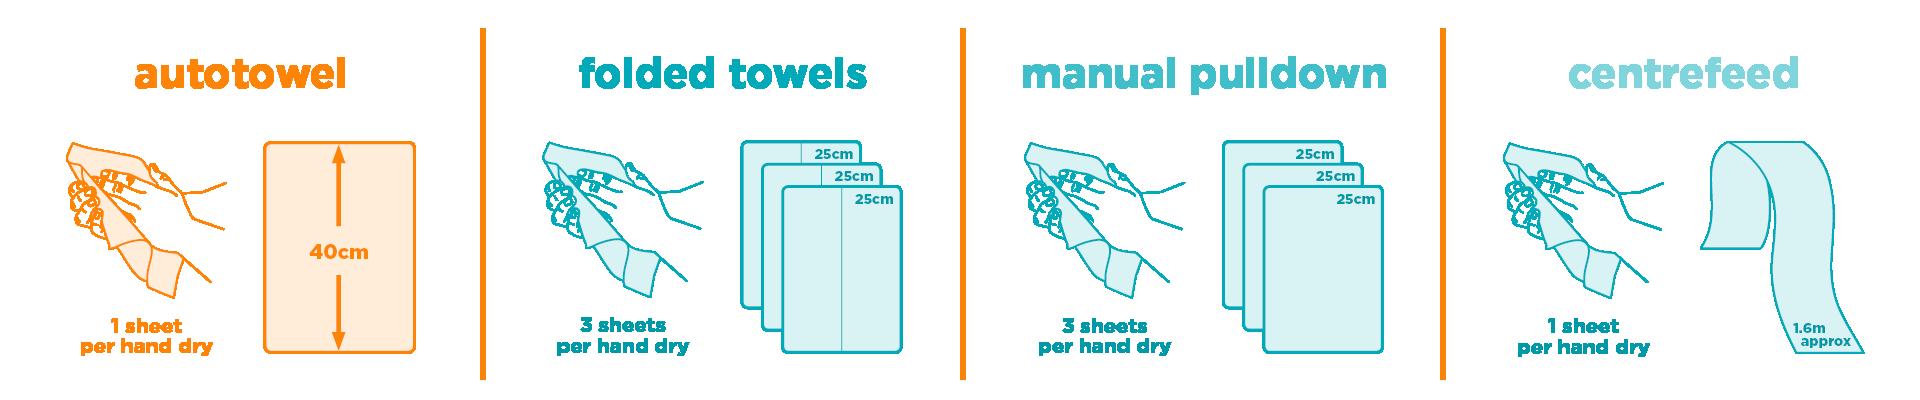 autotowel savings diagram NEW